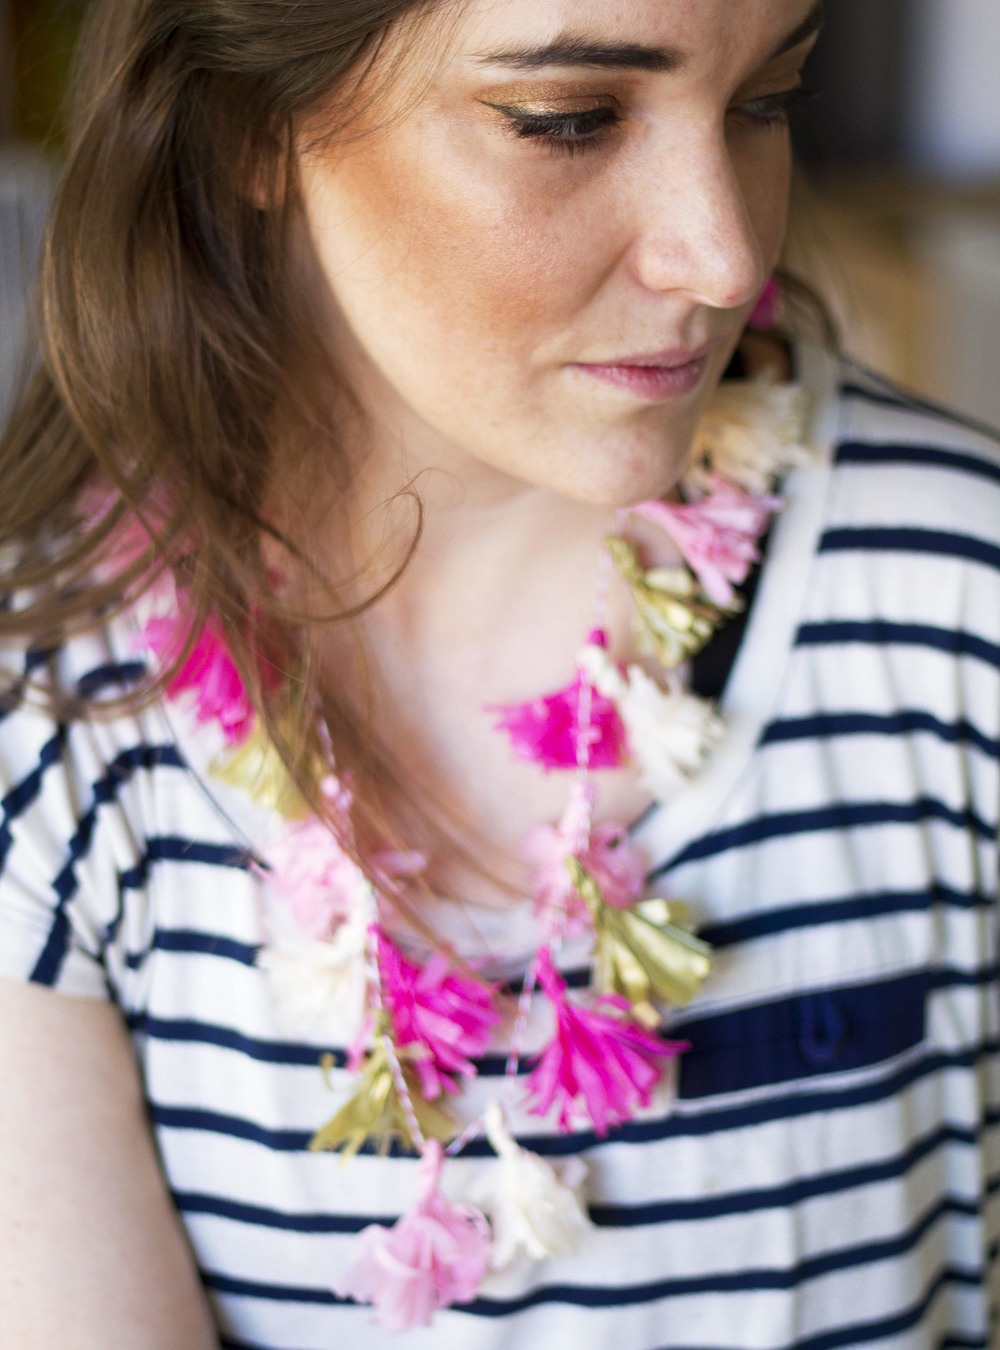 jessica wearing garland.jpg